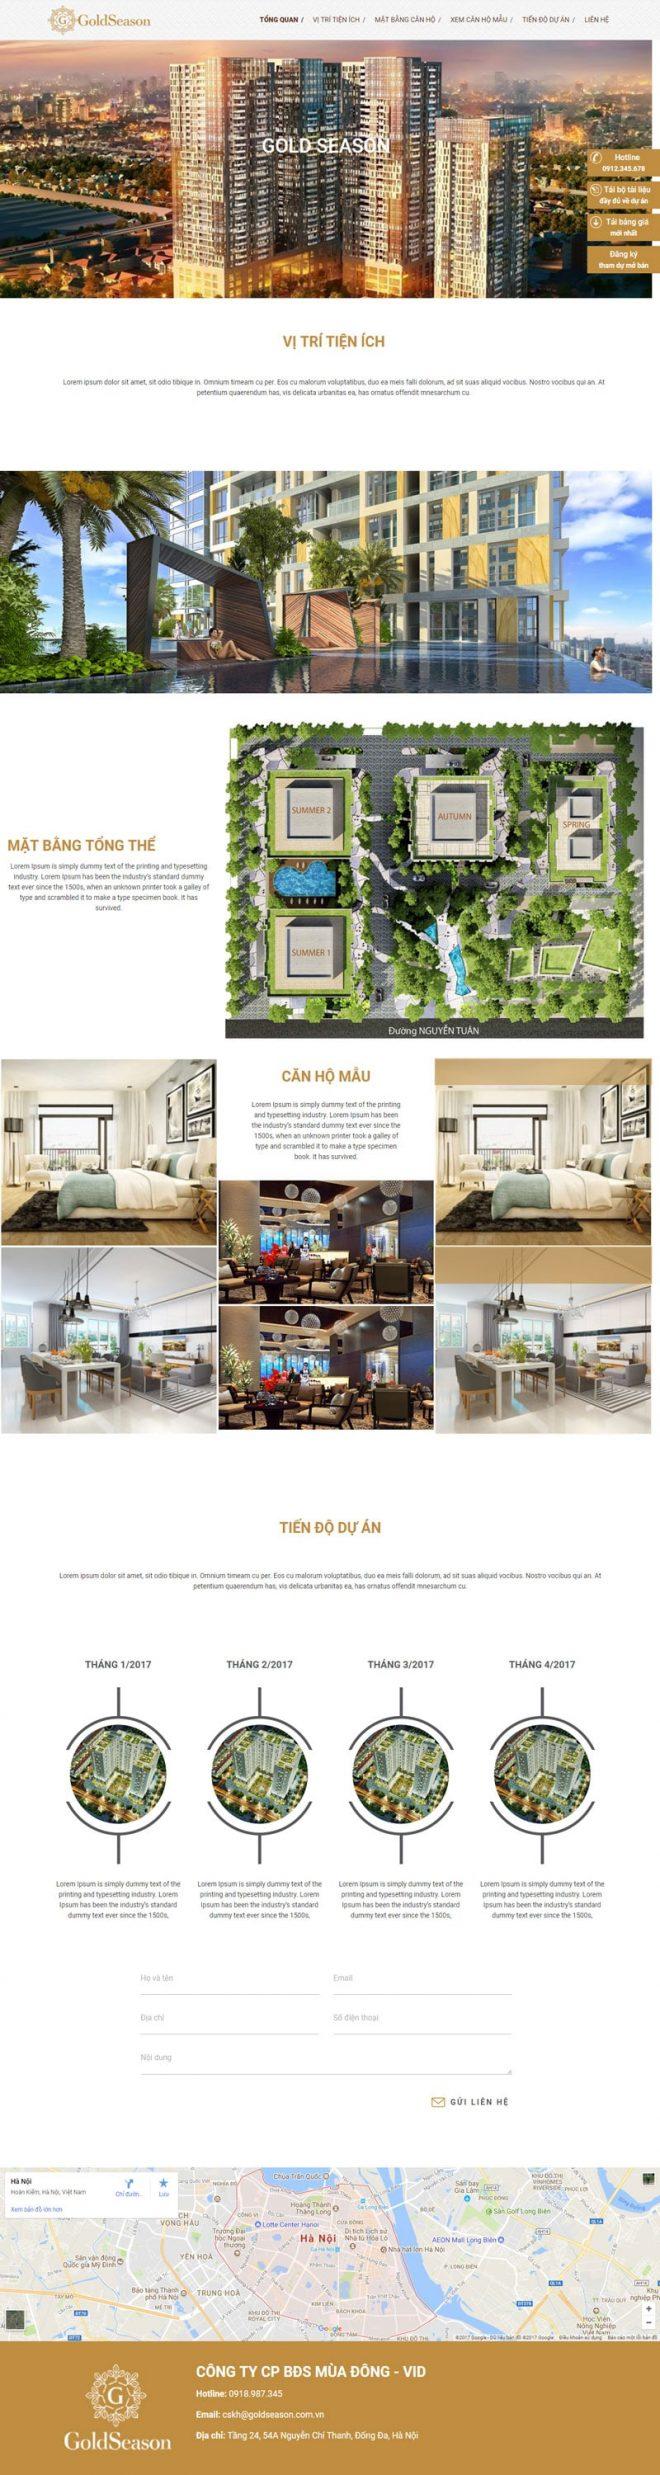 screencapture-batdongsan-mediaworks-vn-du-an-gold-season-1500519720180